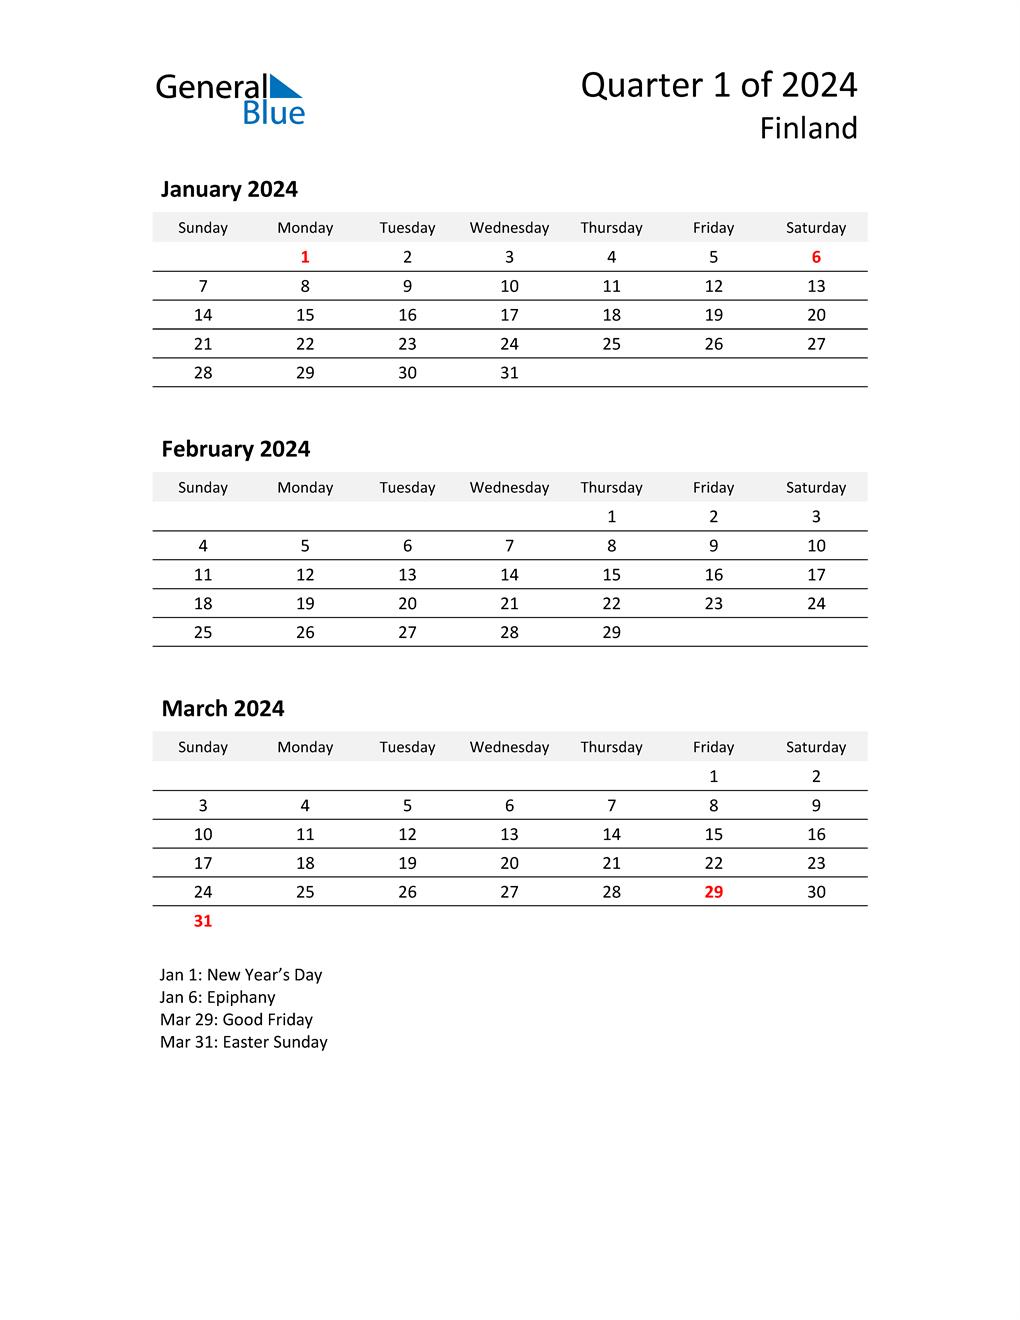 2024 Three-Month Calendar for Finland